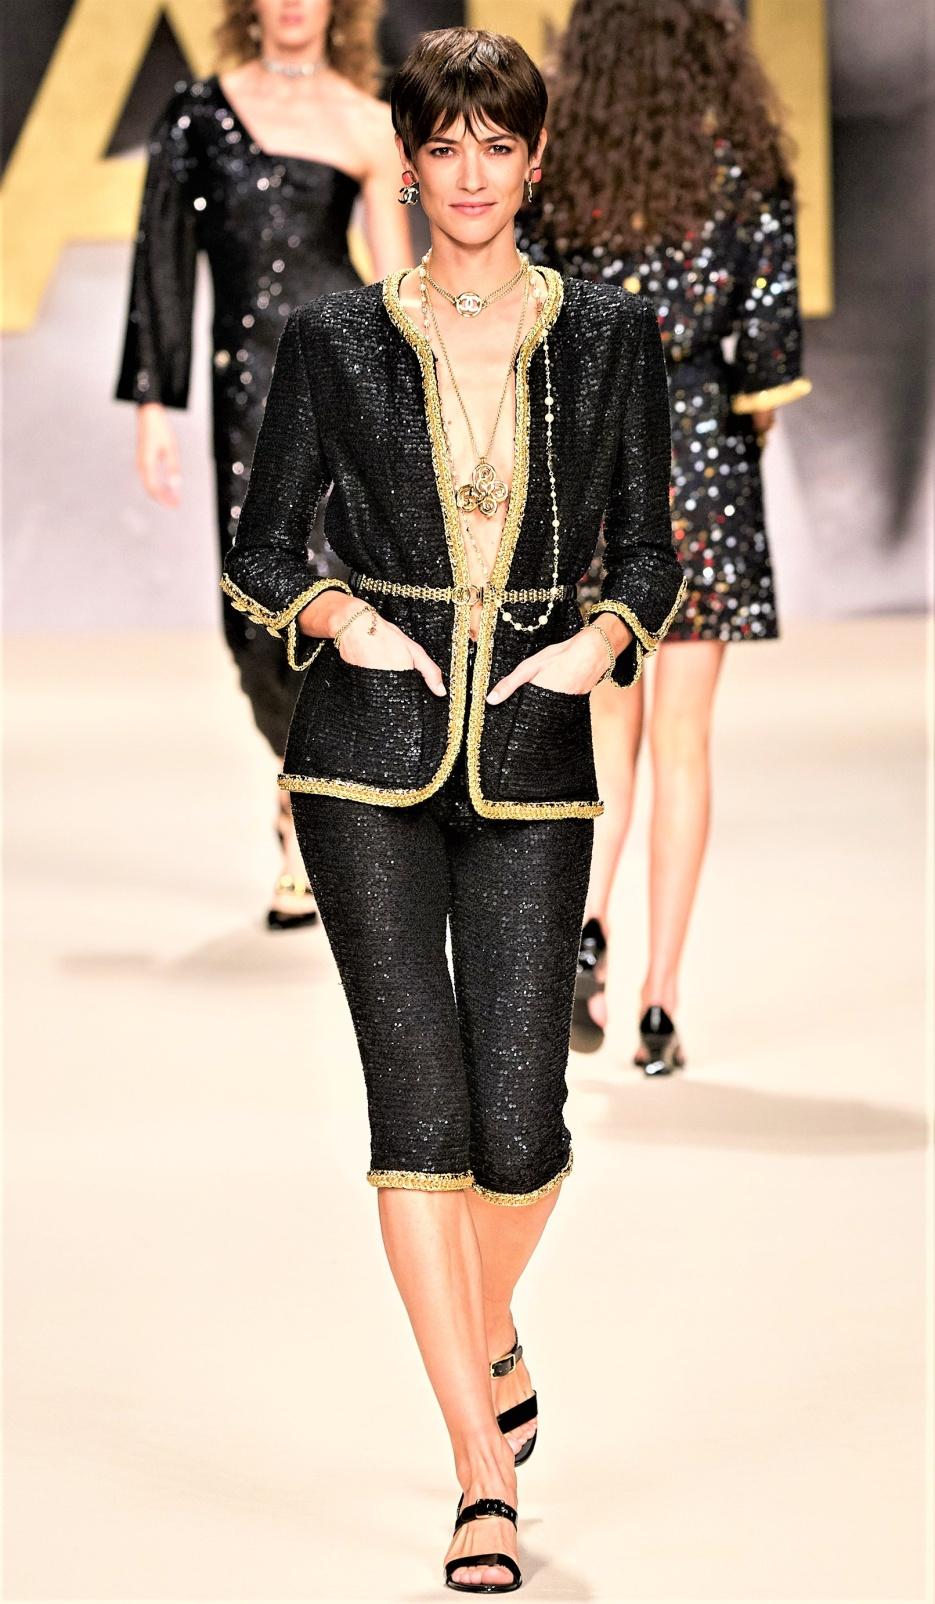 Paris 2. Chanel pants vog cropped.jpg